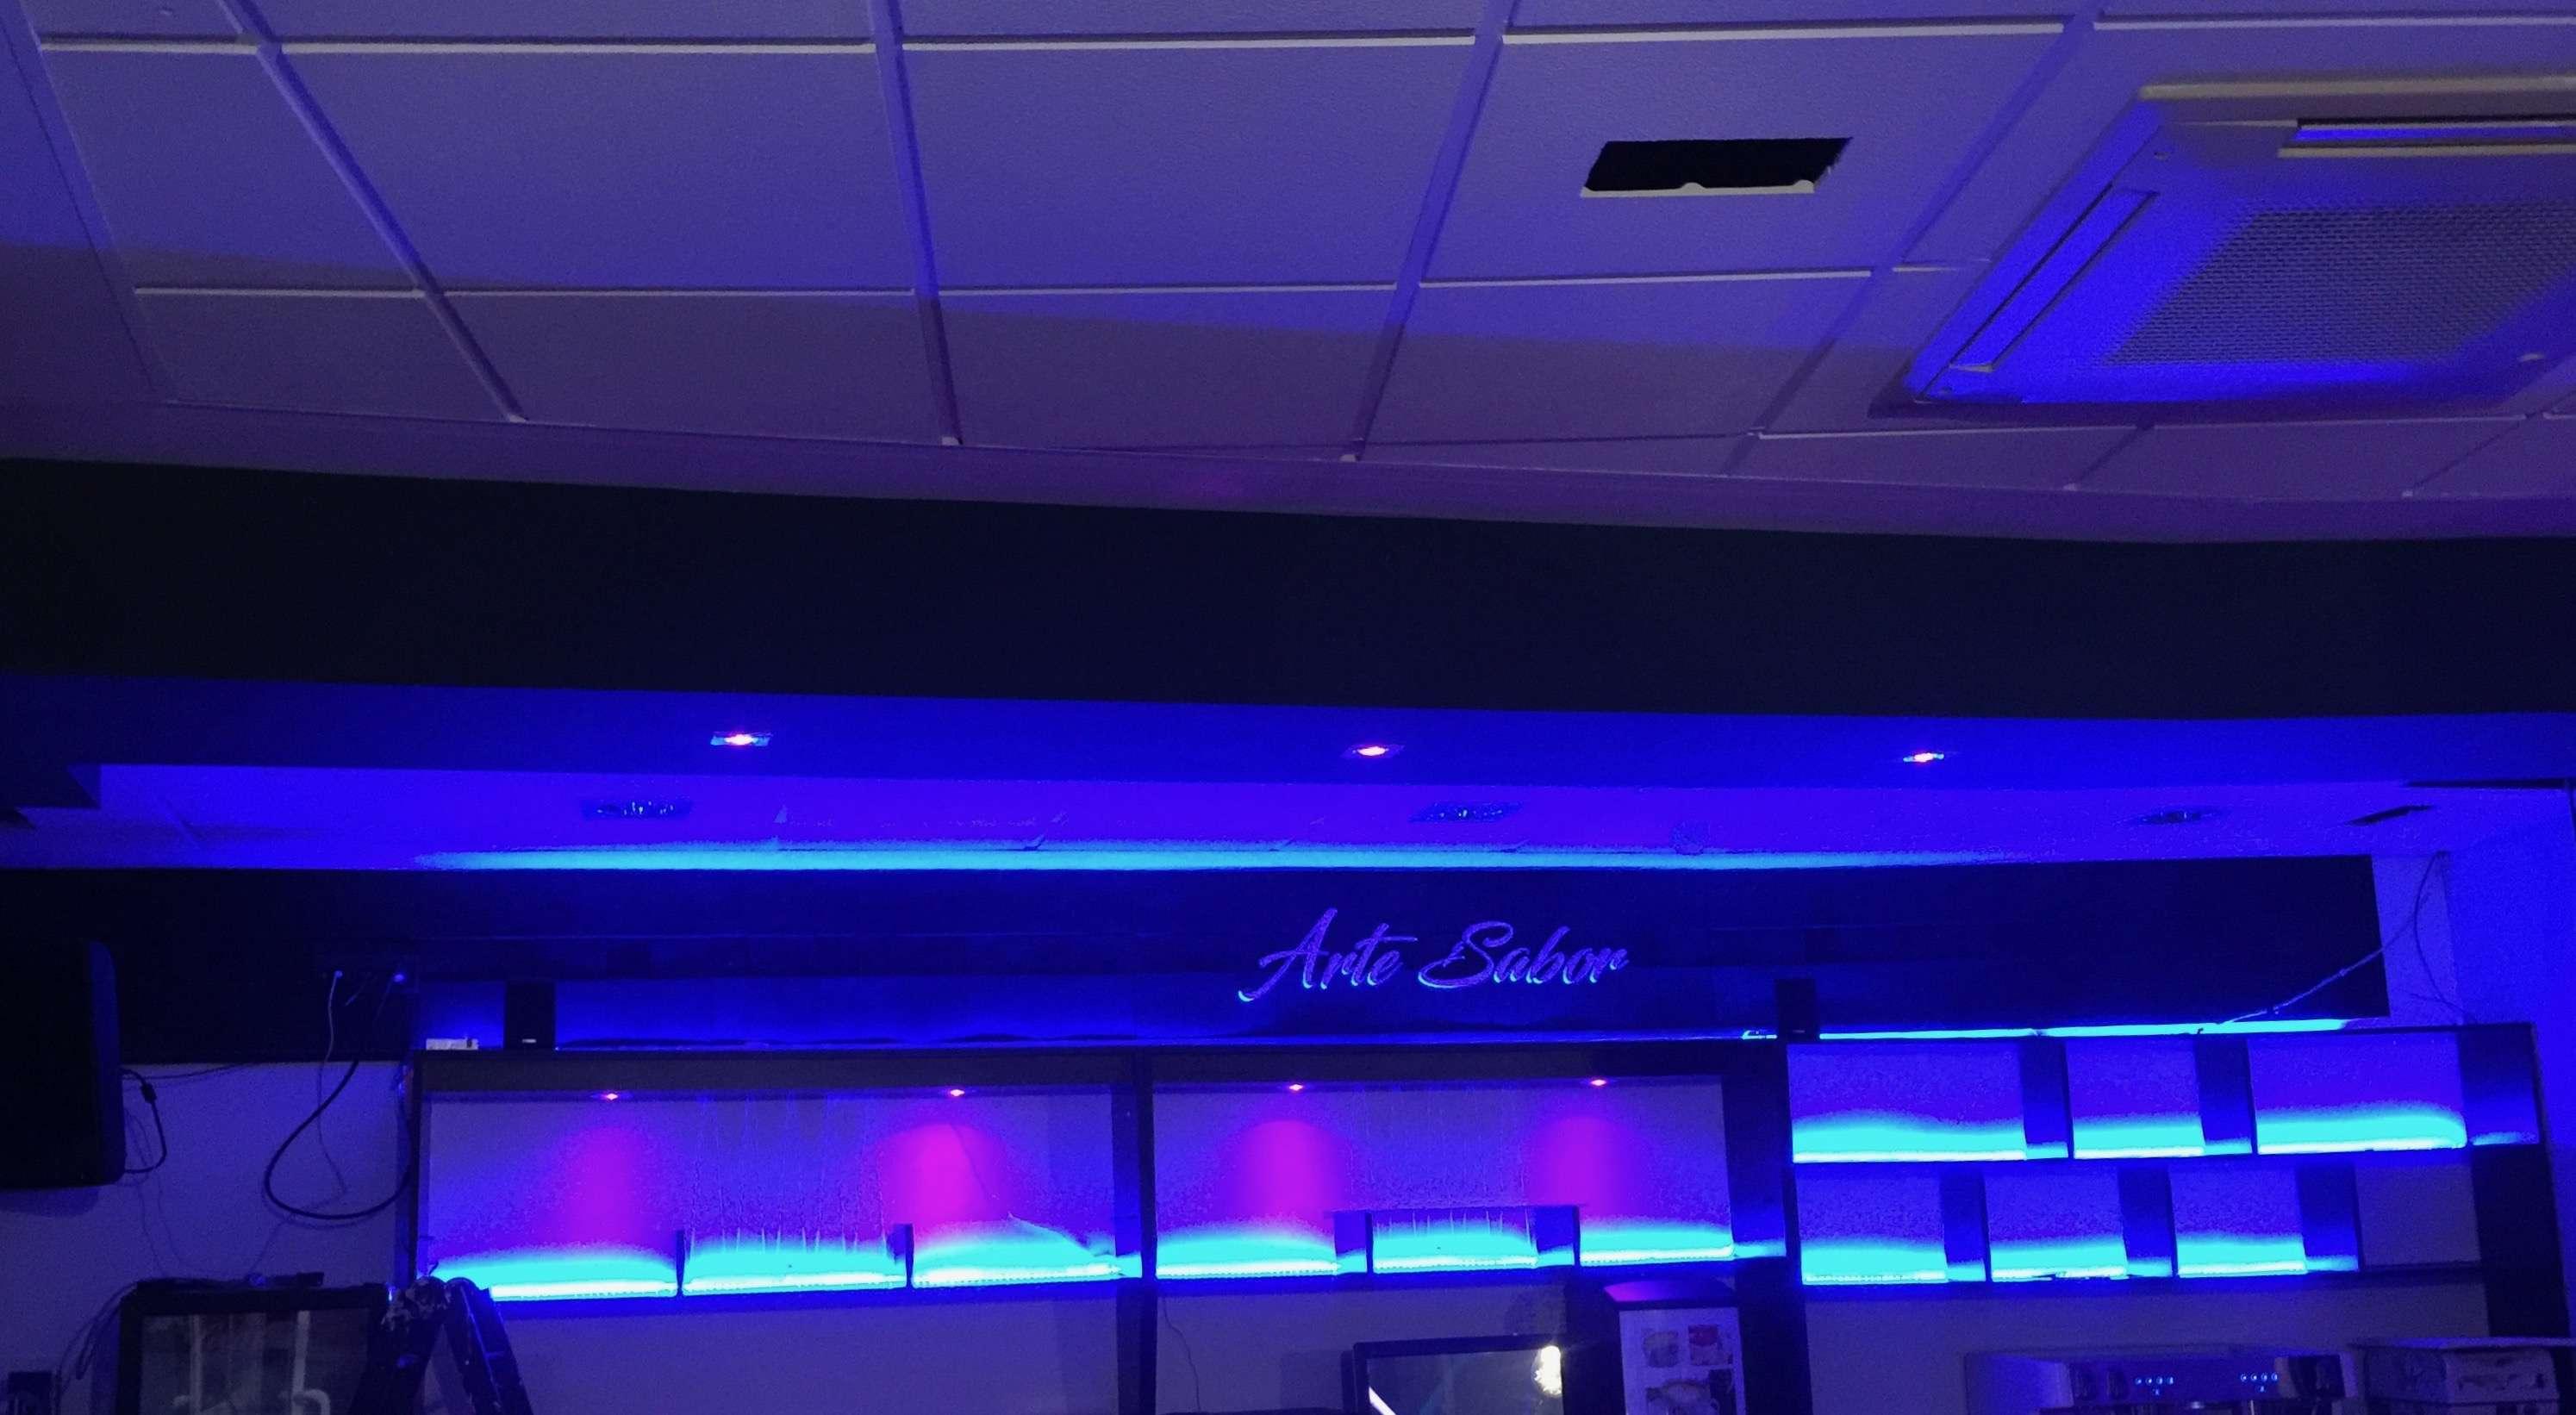 Instalaci N Iluminaci N Led Cafe Copas Arte Y Sabor La